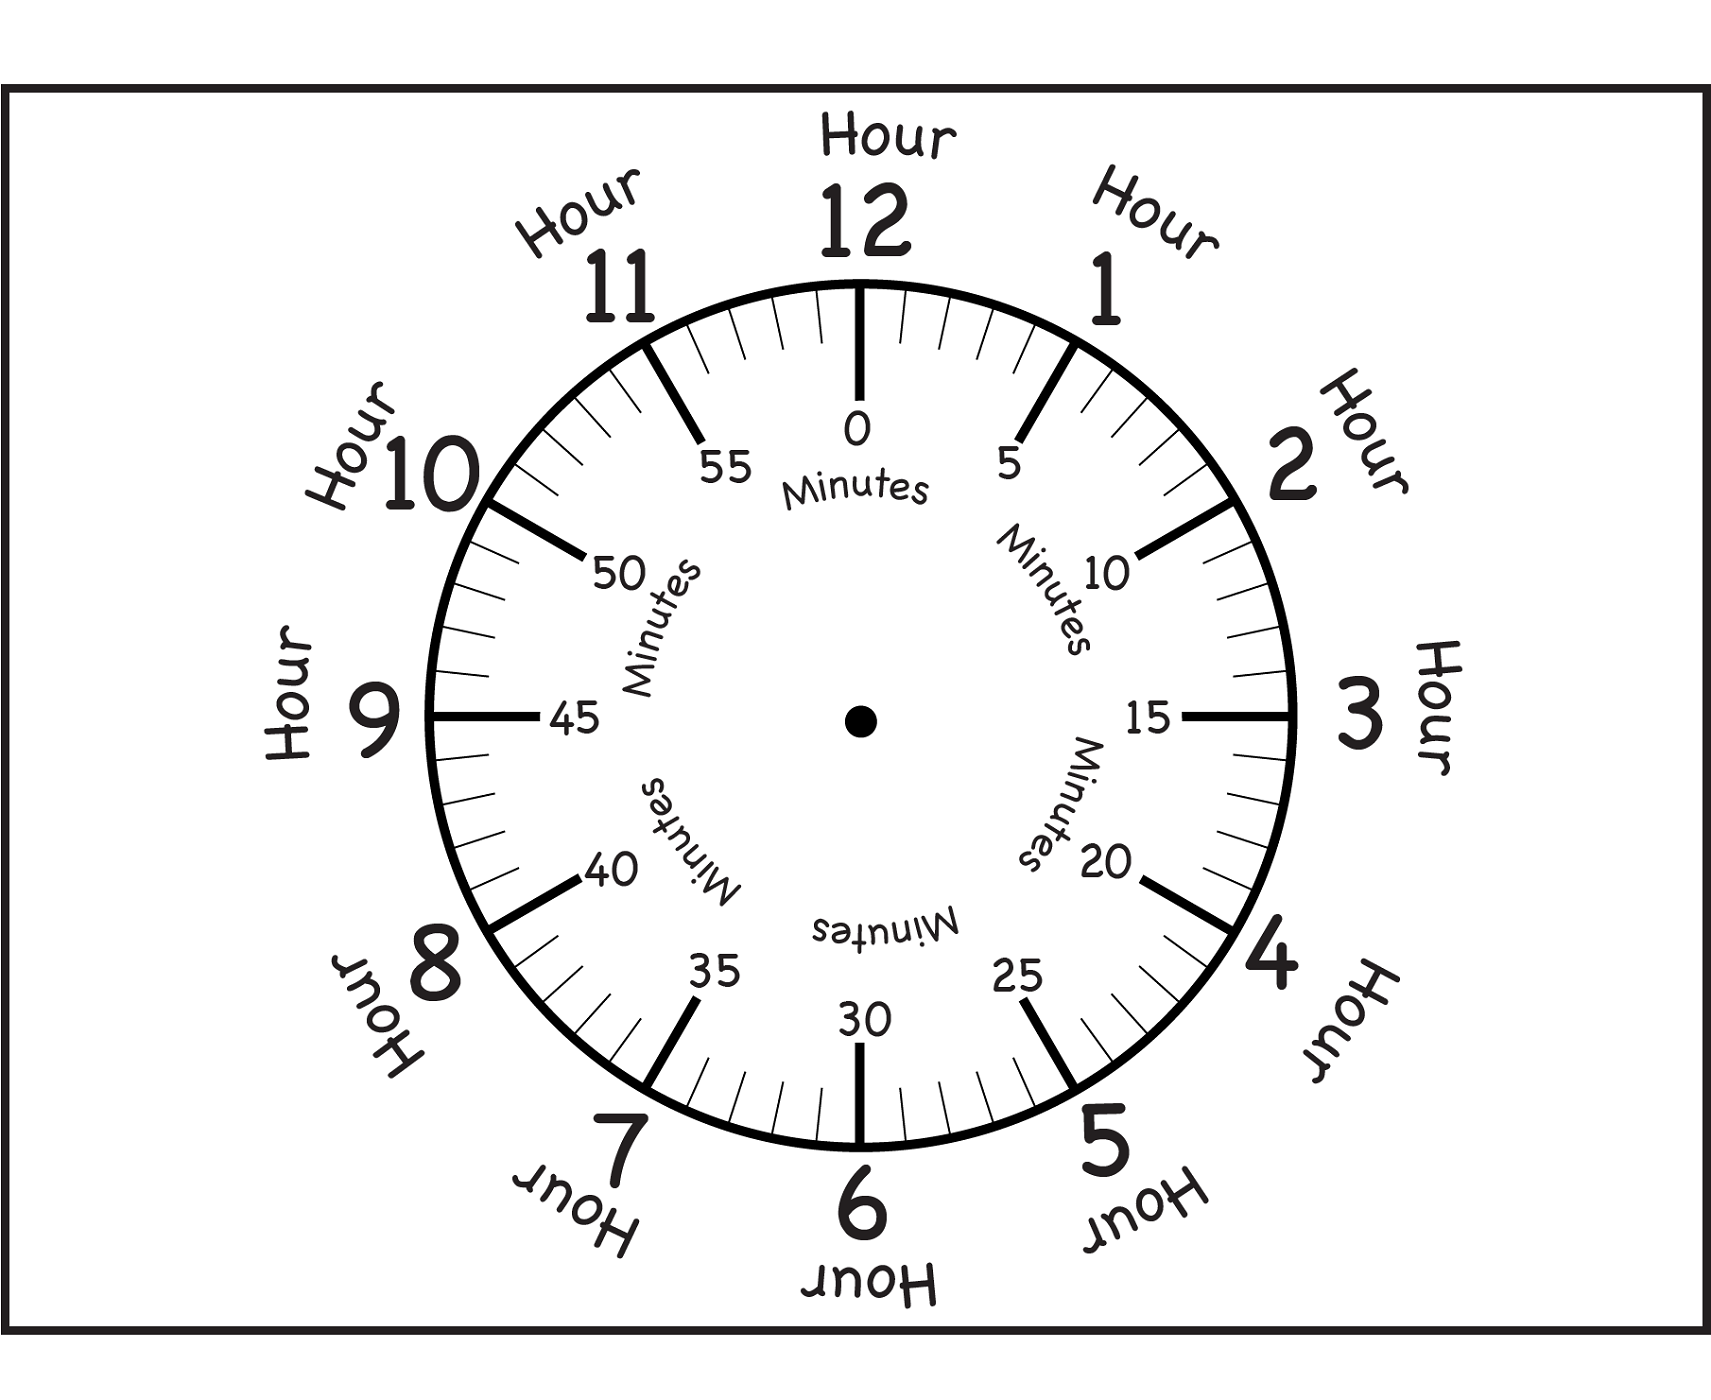 Worksheets Blank Clock Face Worksheet Printable printable clock for media reading fancy stuff pinterest face clock